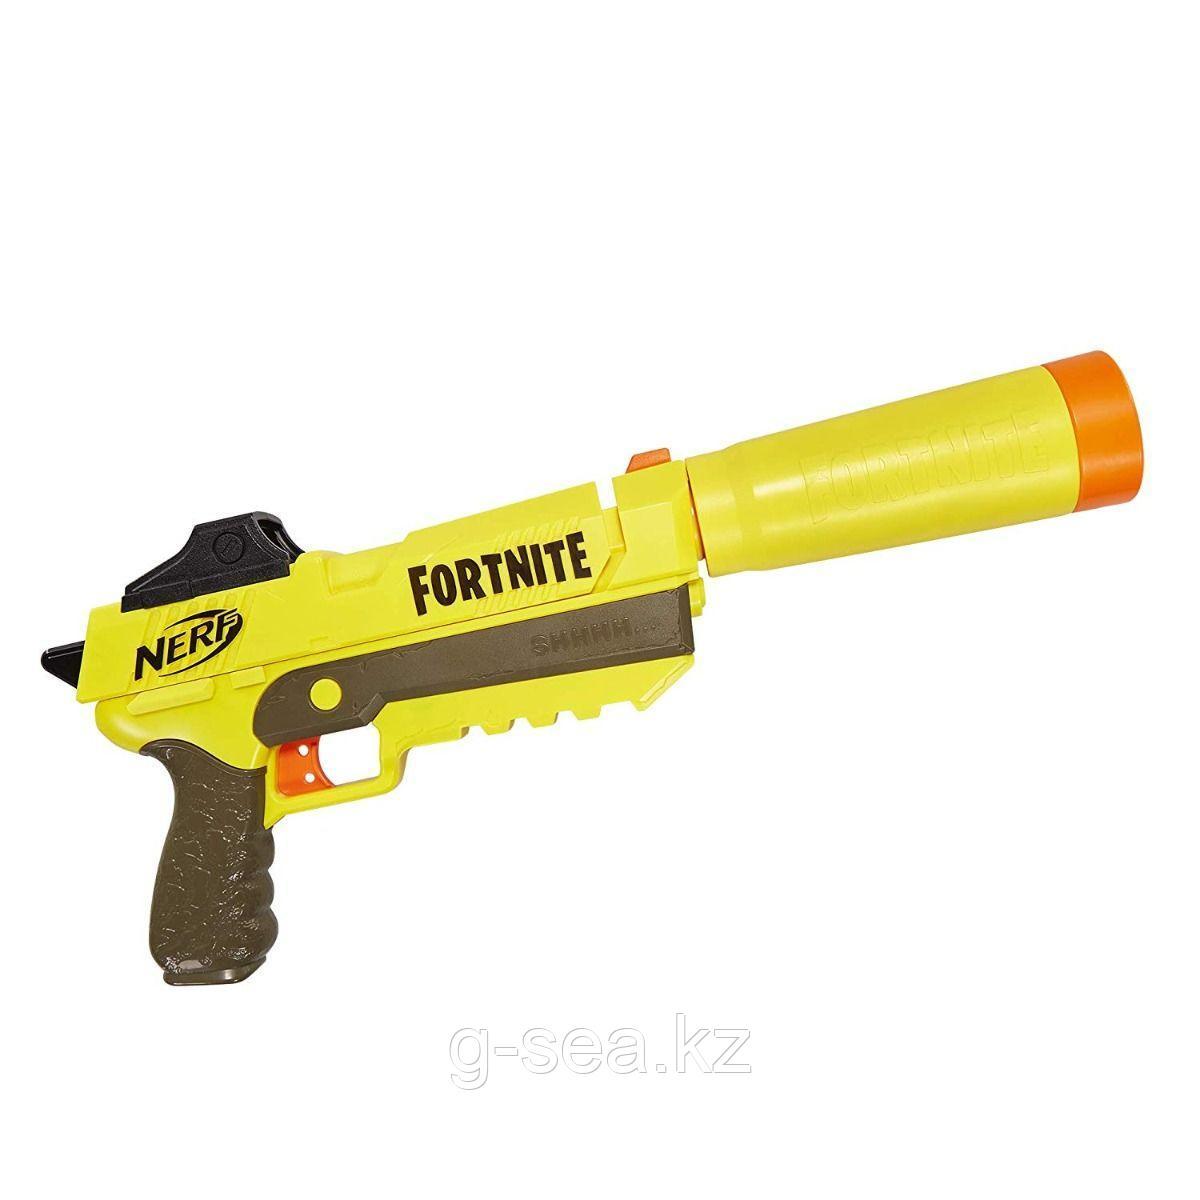 Nerf: Fortnite. Спрингер